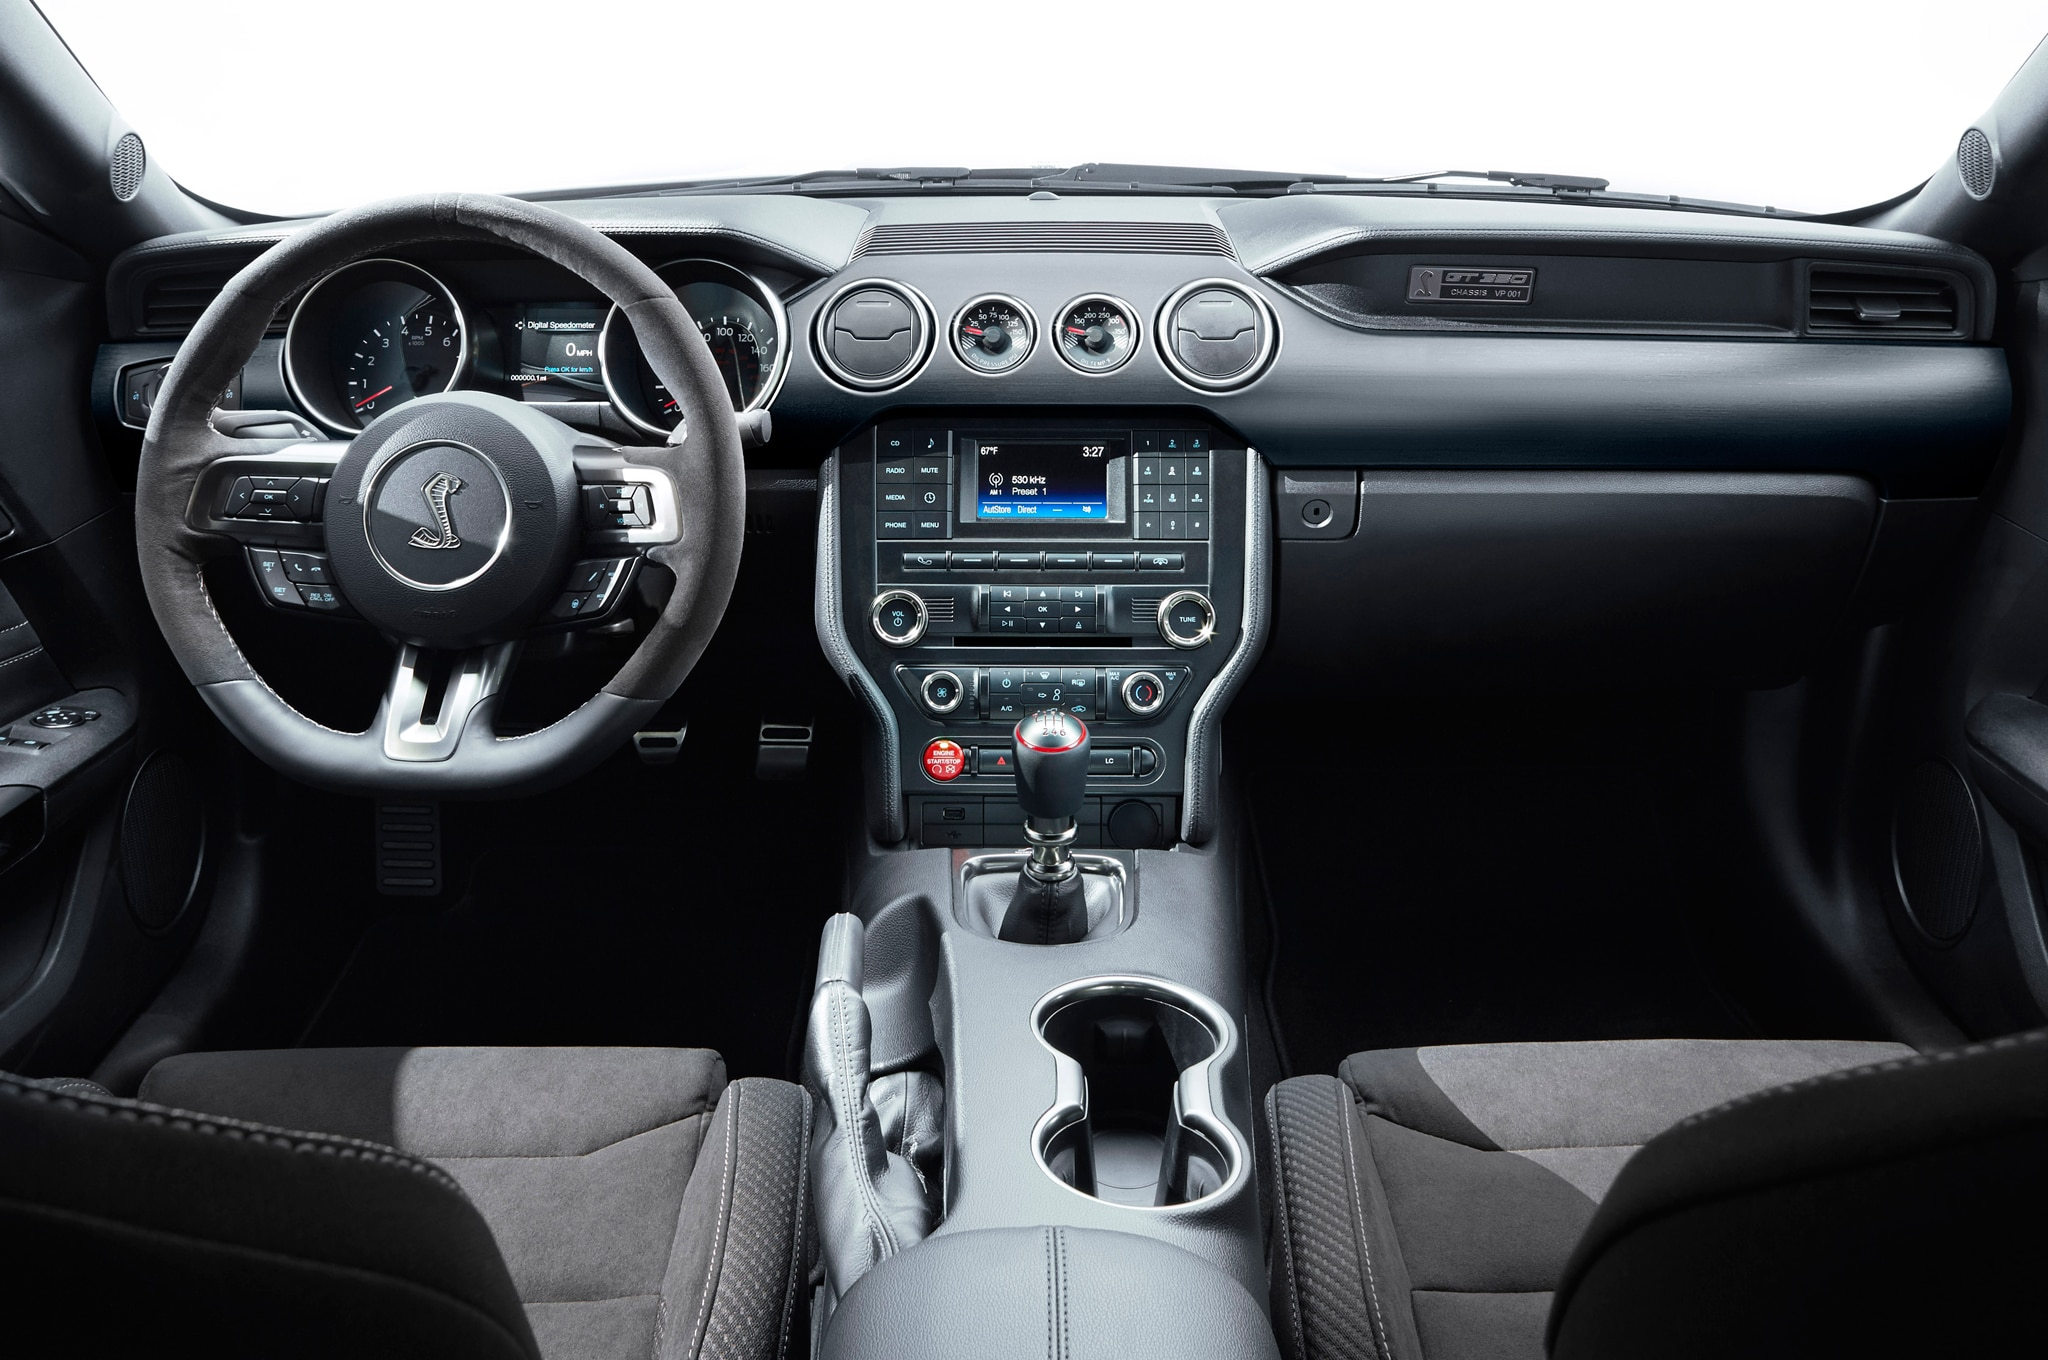 show more - Ford Torino 2015 Interior